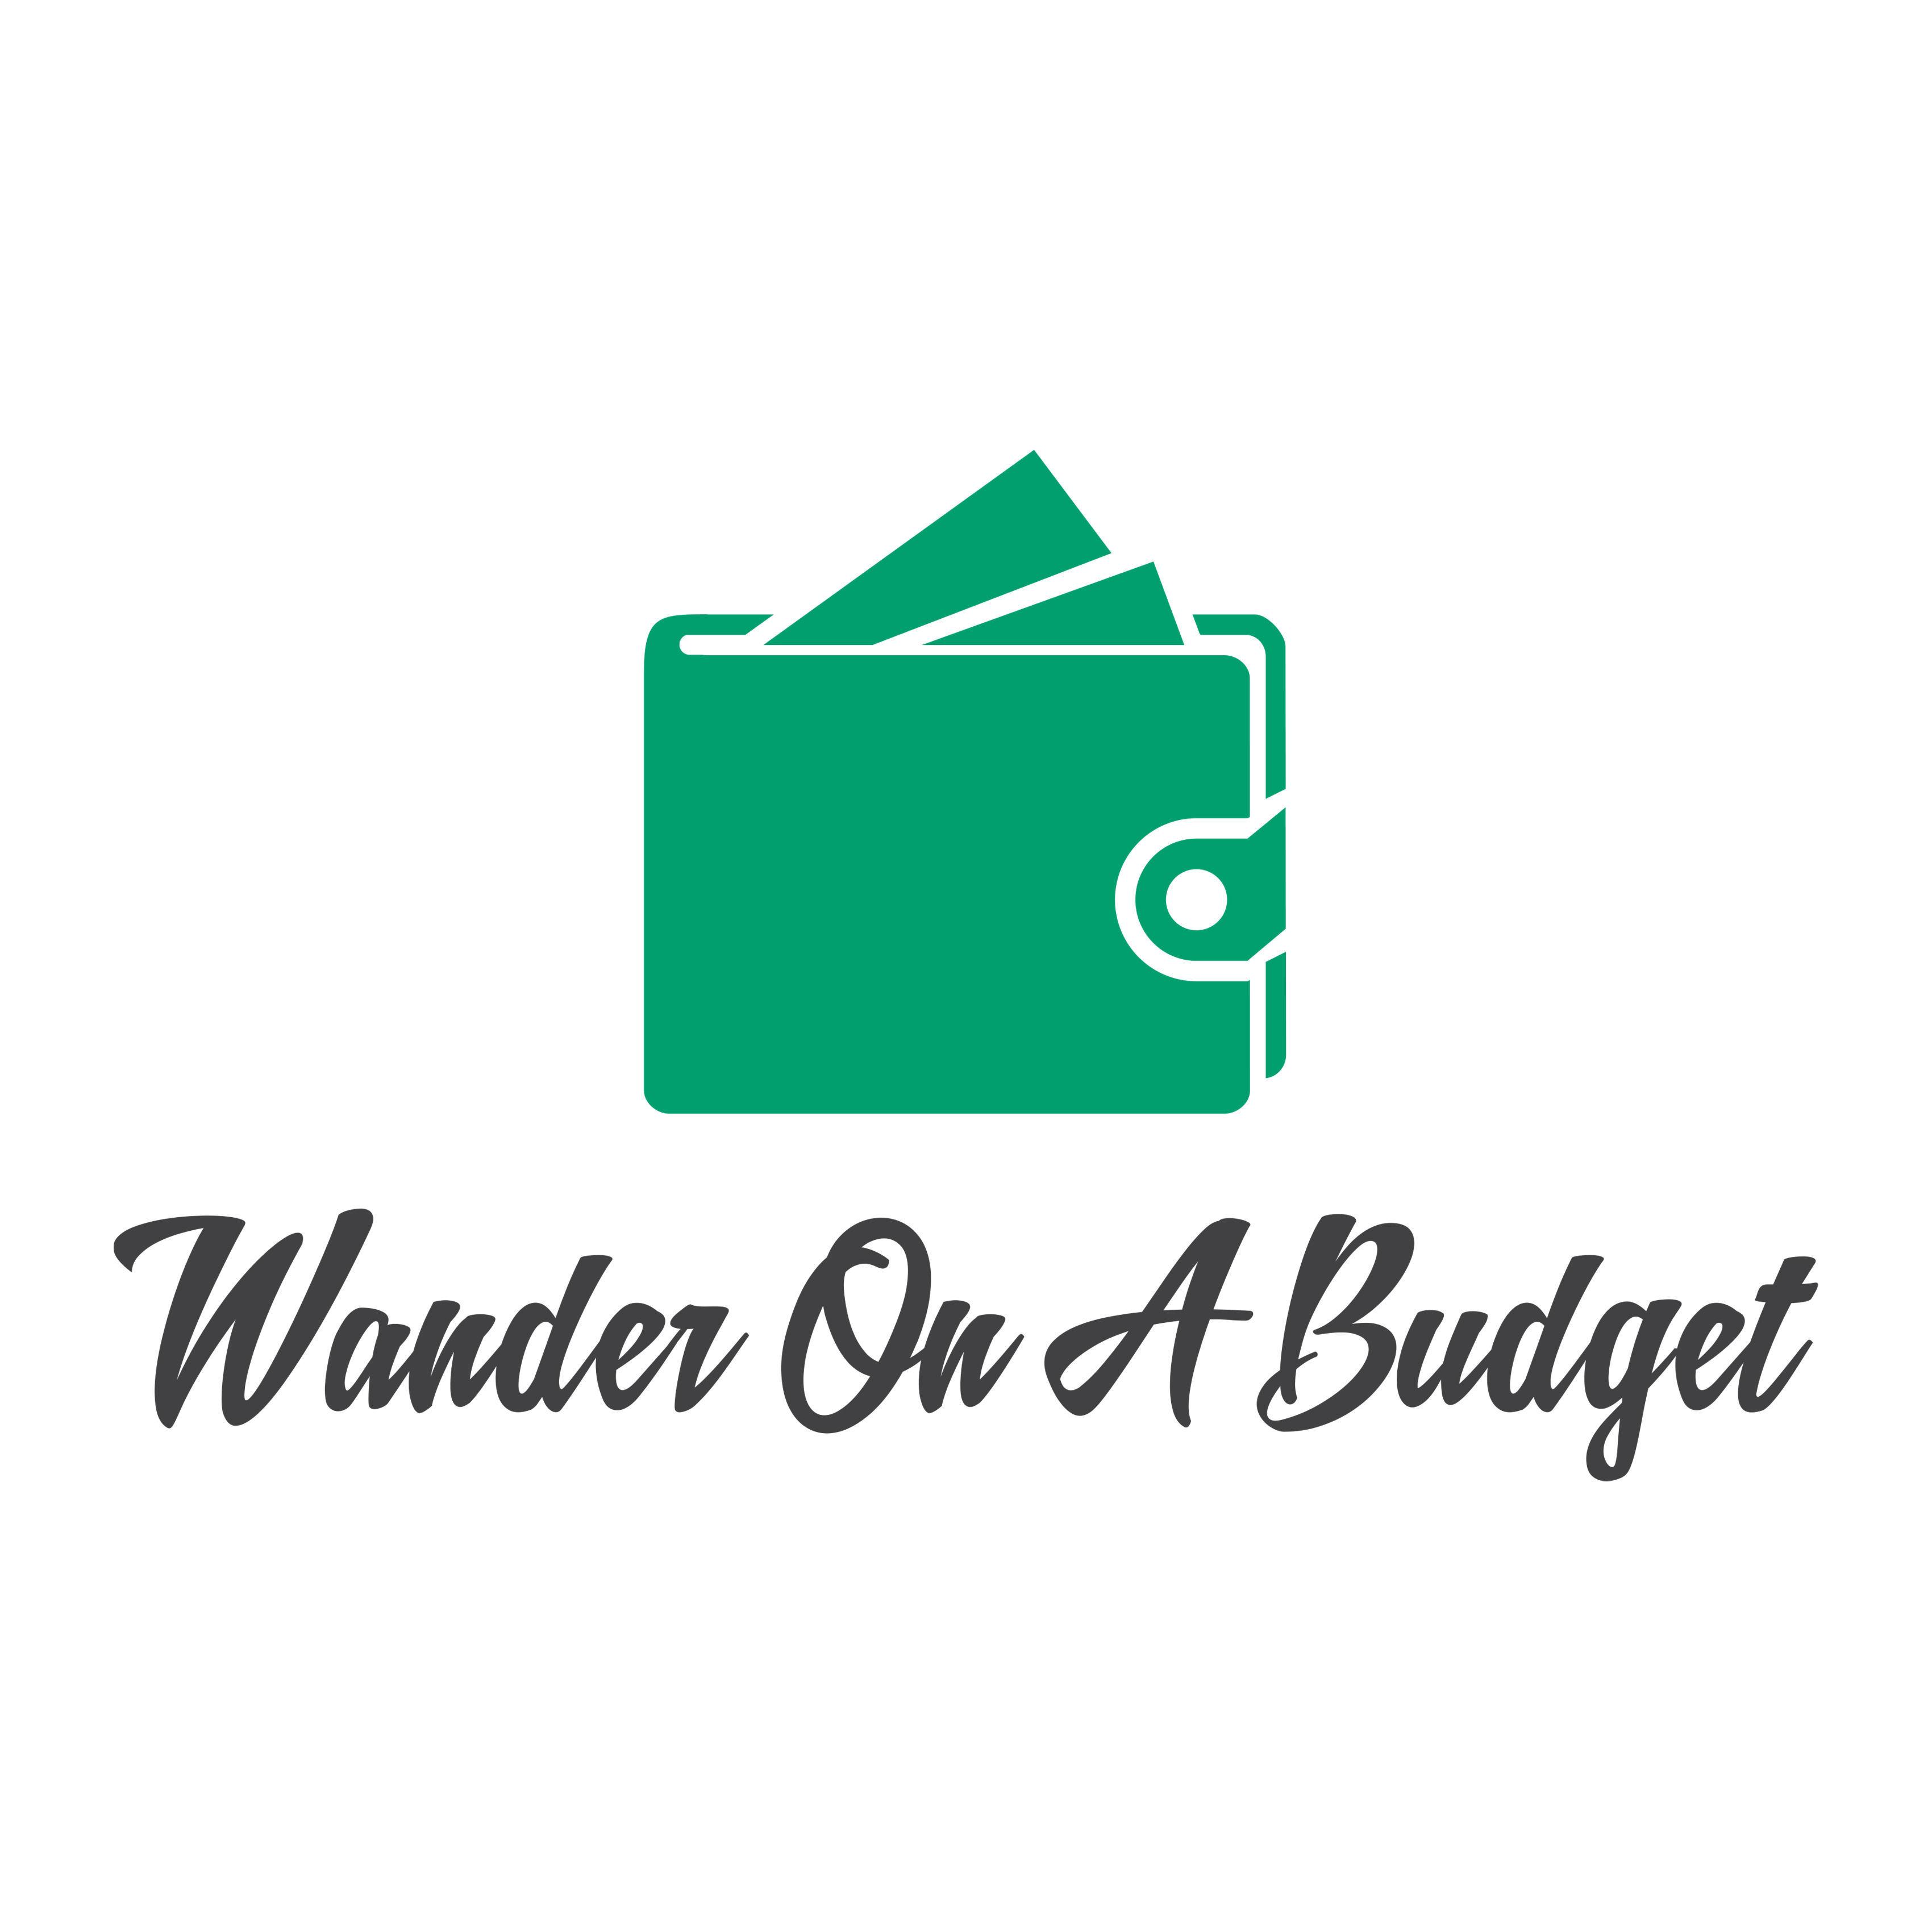 Wander on a Budget